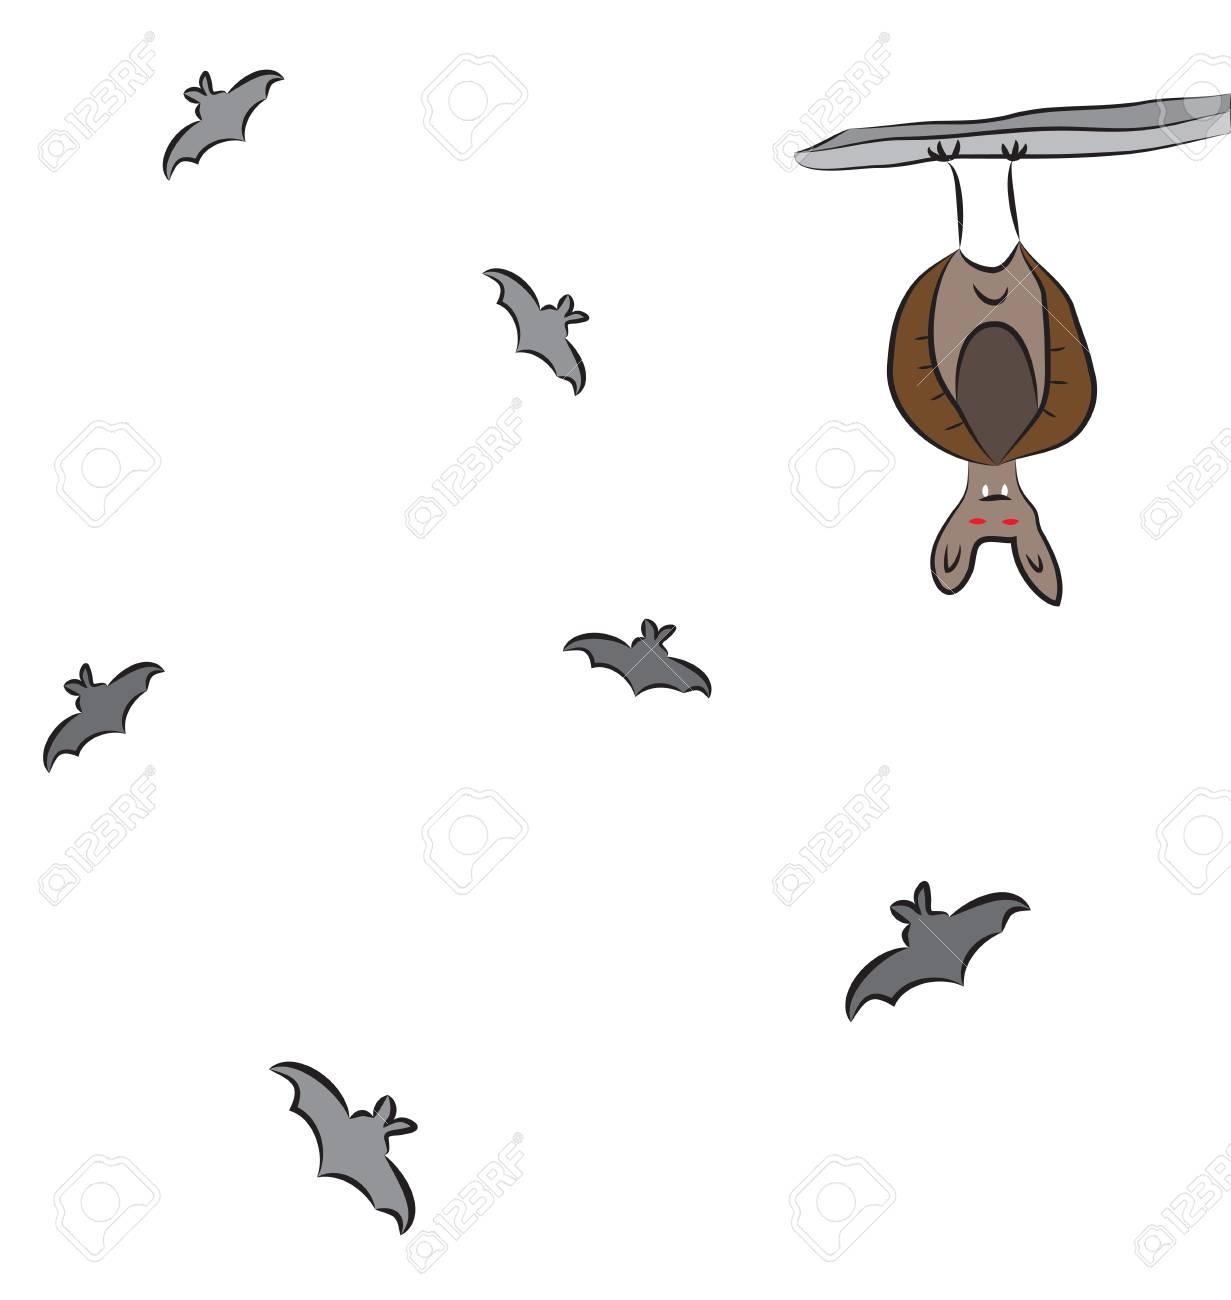 Flying group of bats, resting bat hanging upside down..